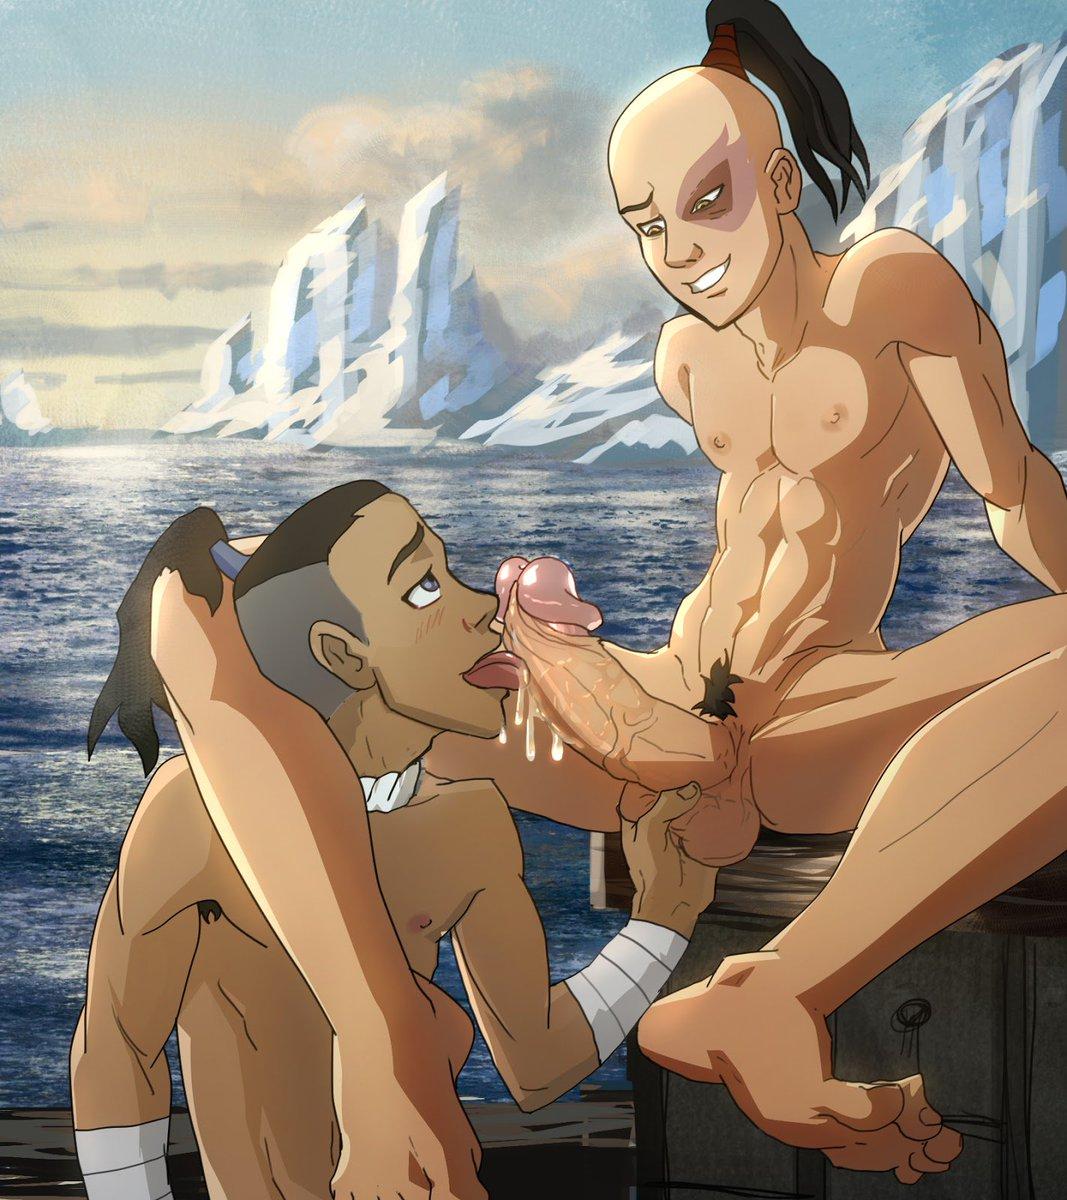 Gaysex cartoon aang